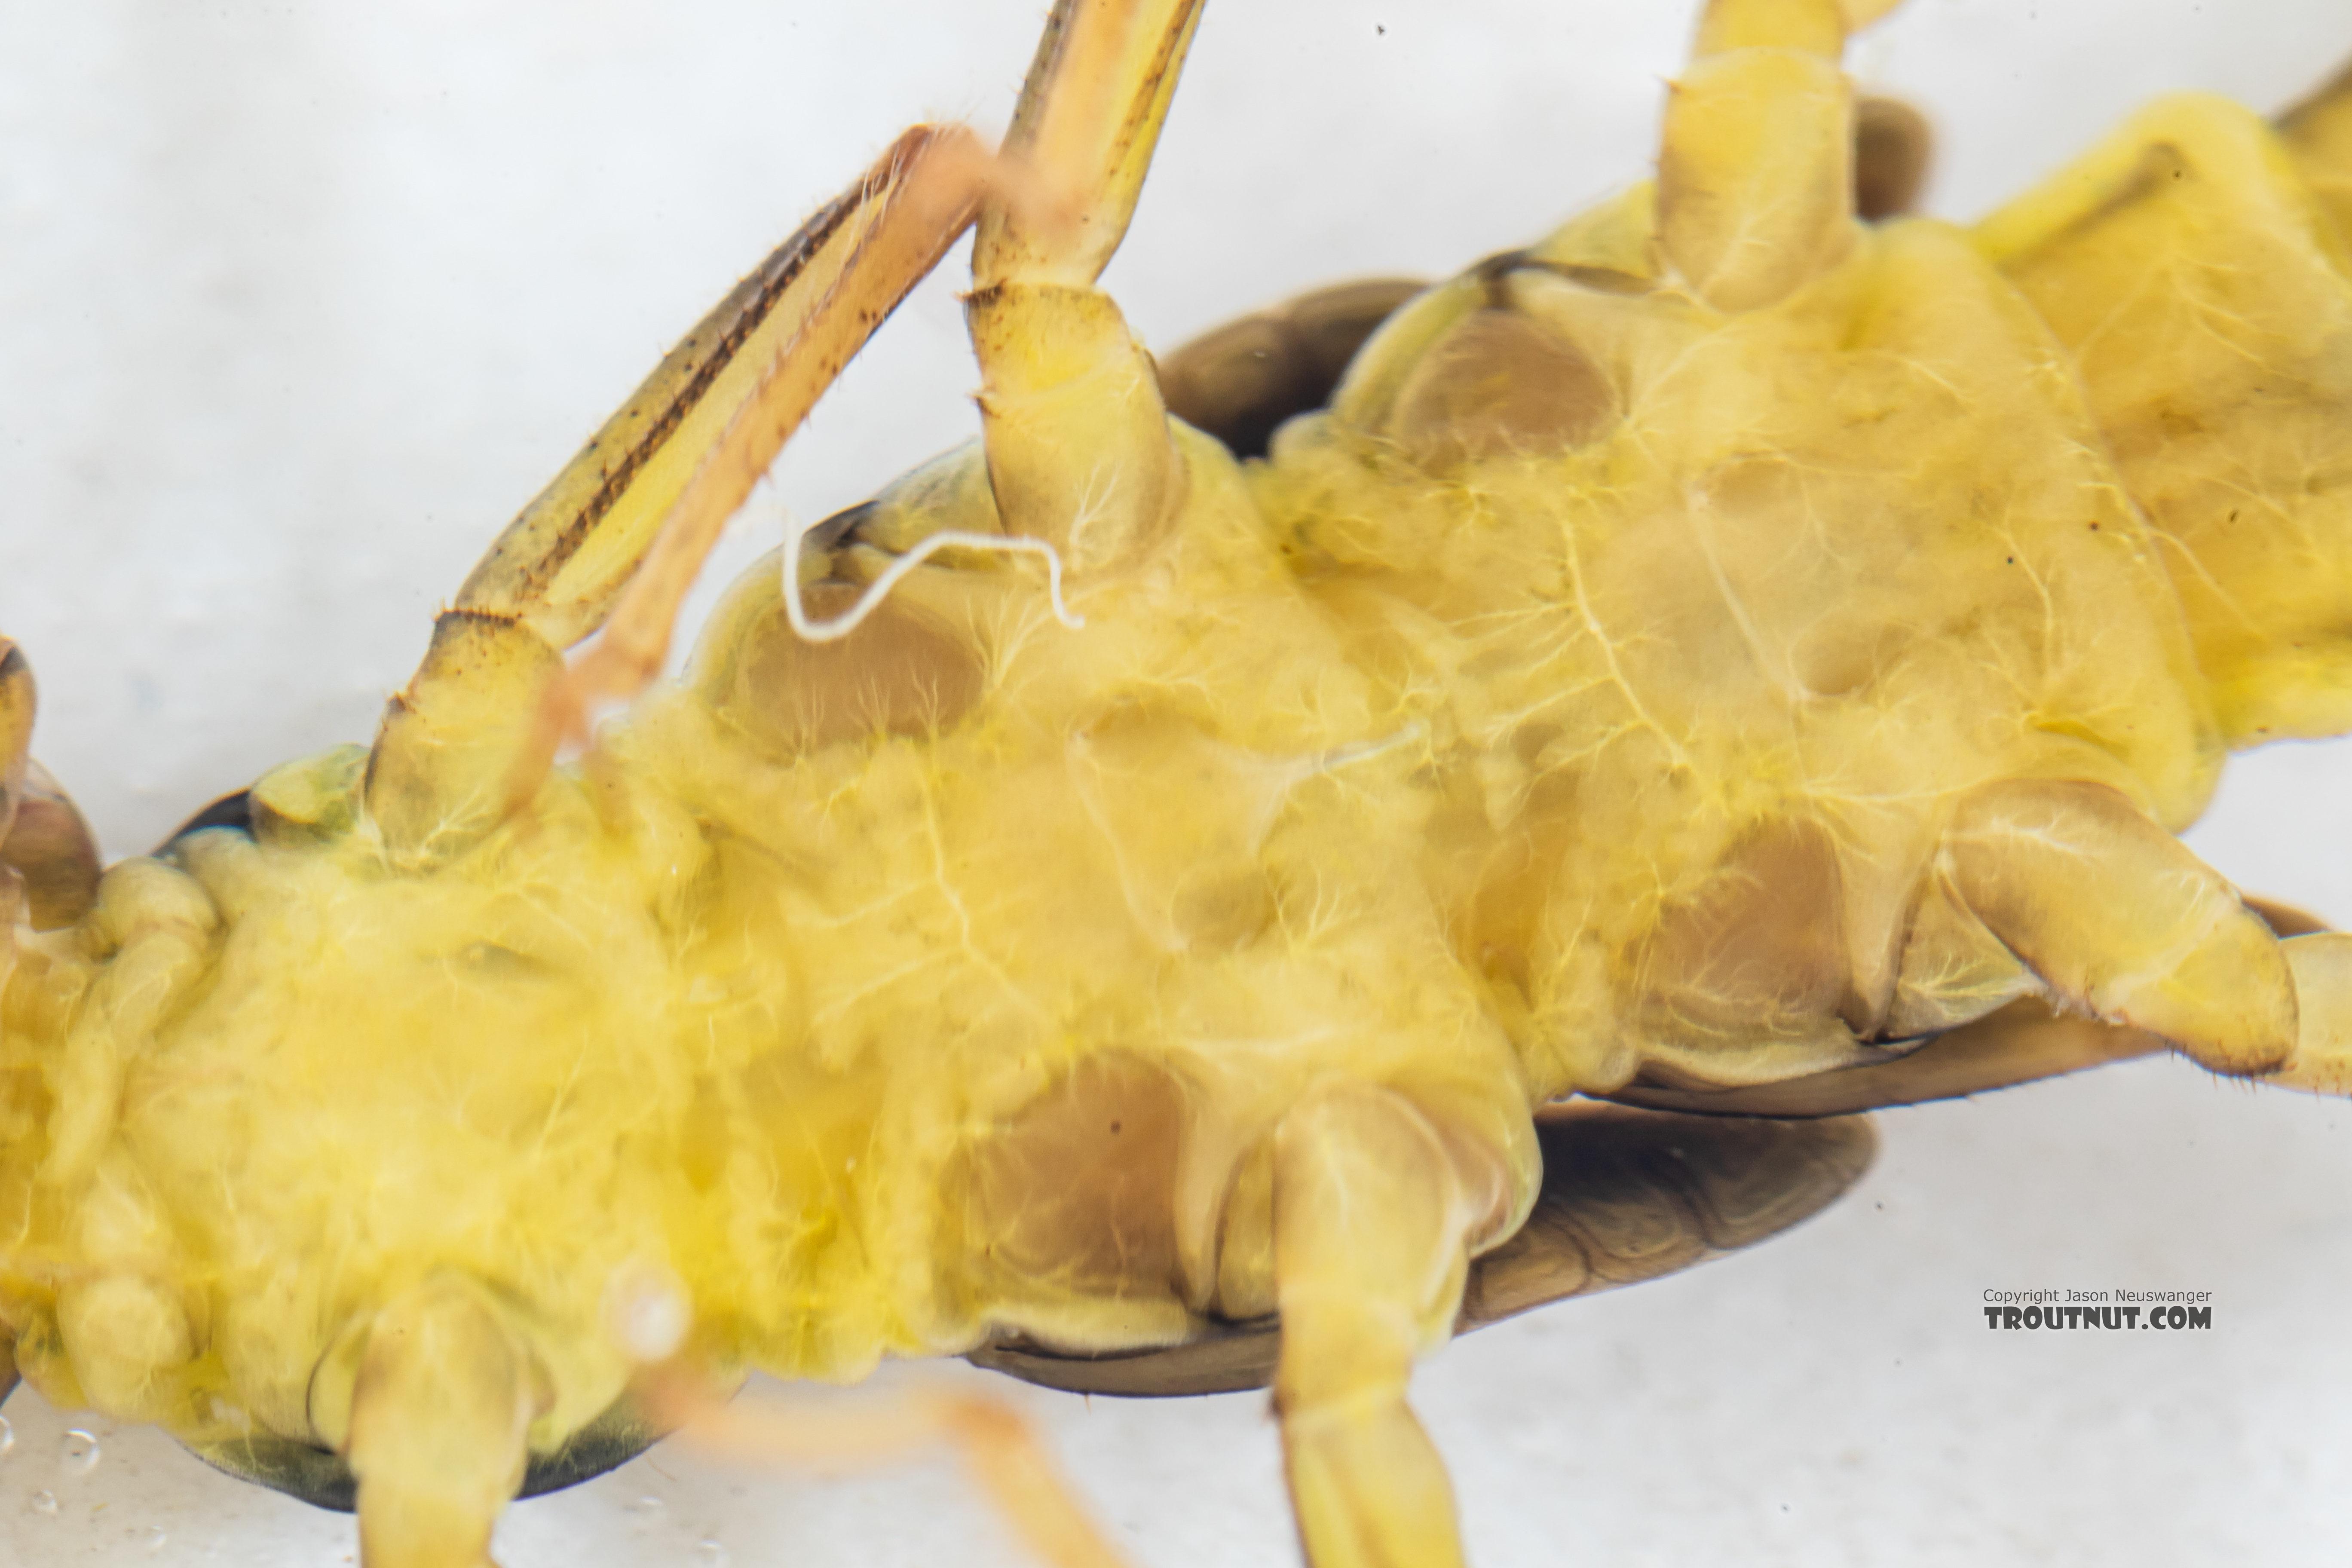 Kogotus nonus Stonefly Nymph from Mystery Creek #199 in Washington